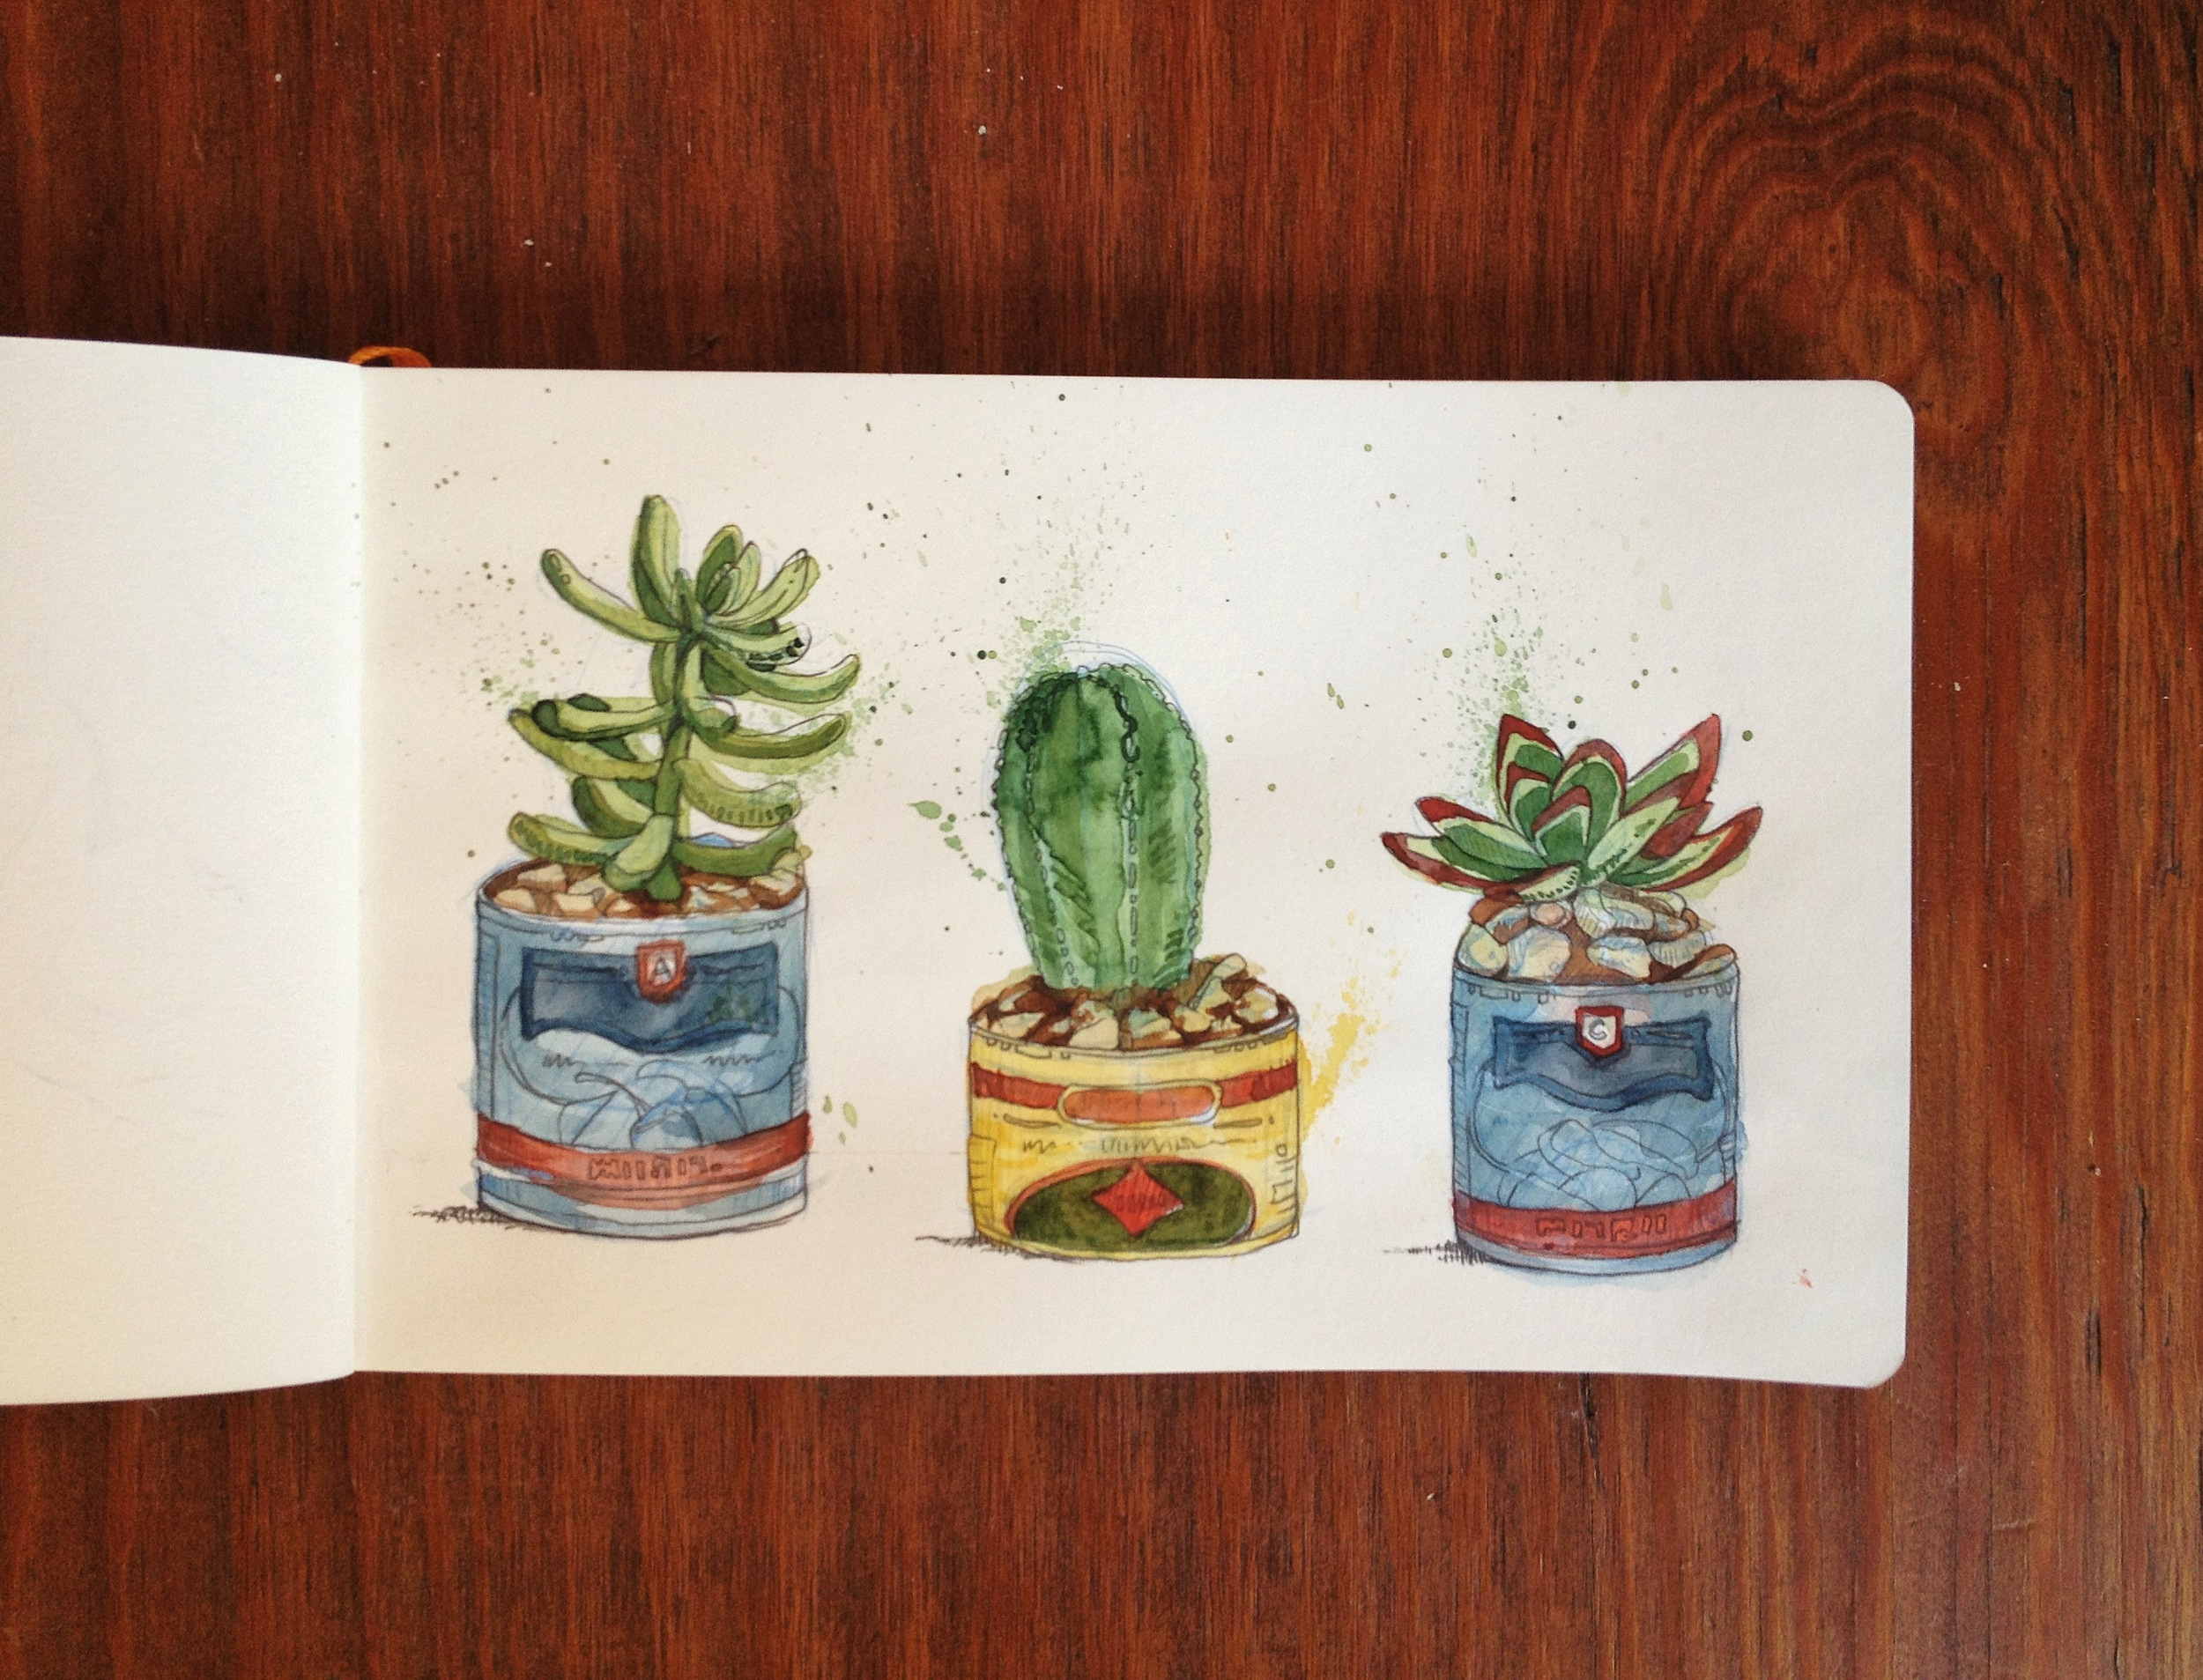 Sketch of Succulents by Chloe Yingst | chloedraws.com